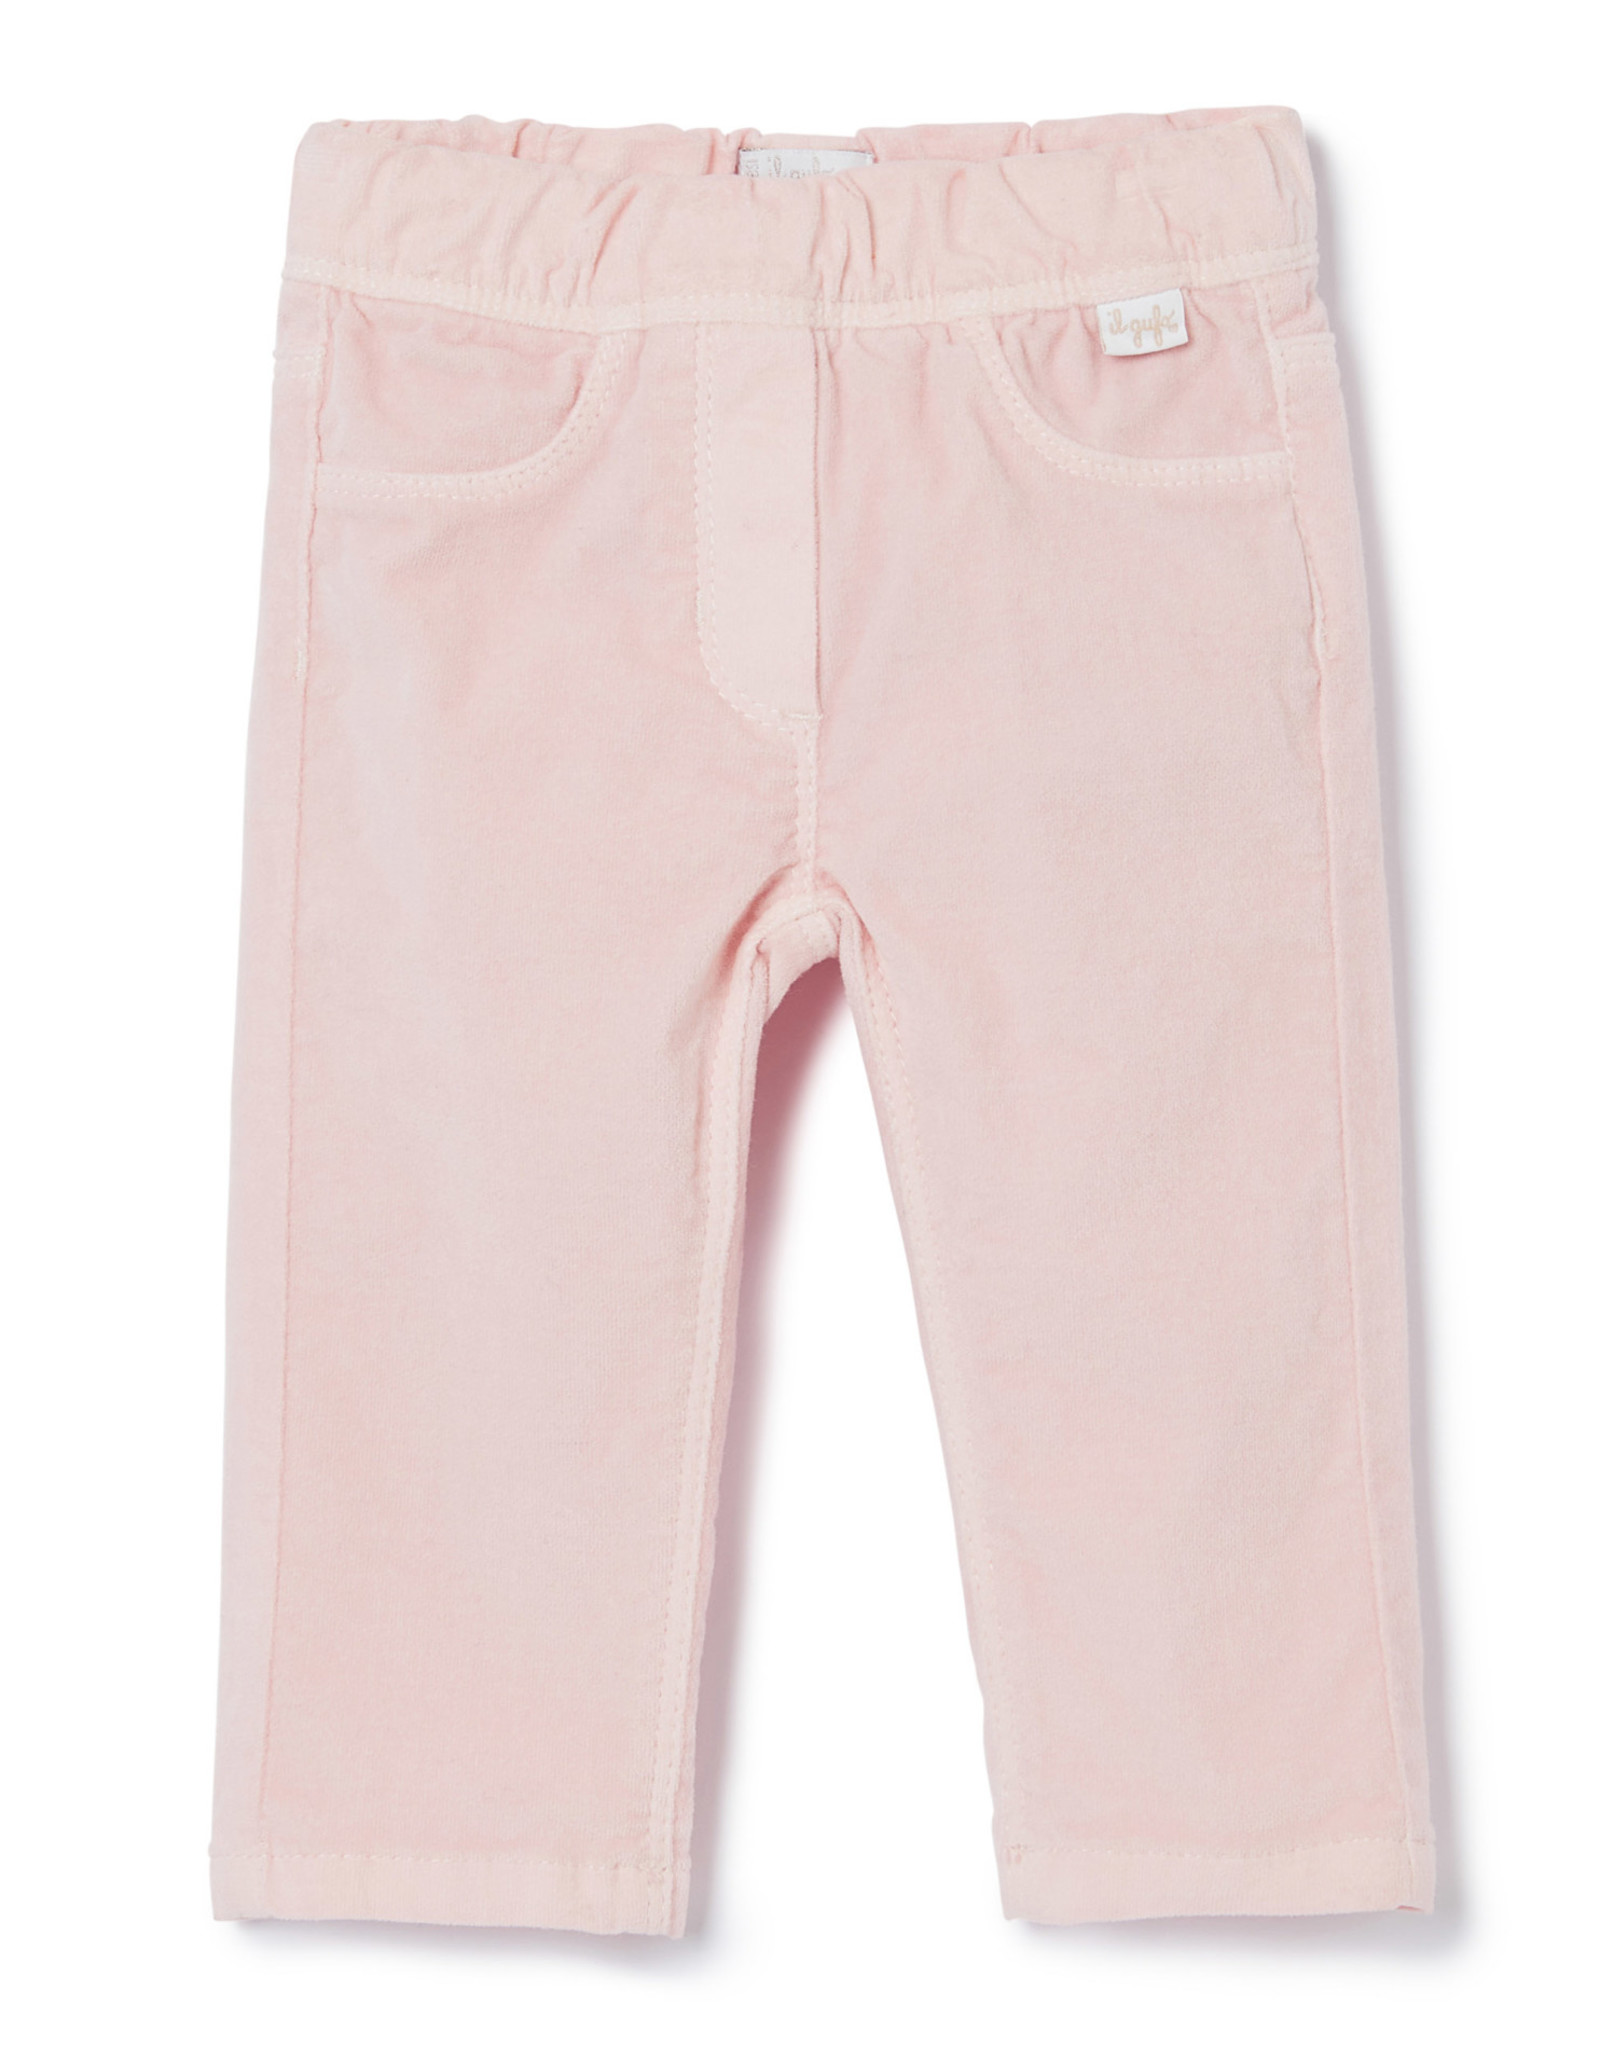 IL GUFO Baby Trousers Quartz Pink